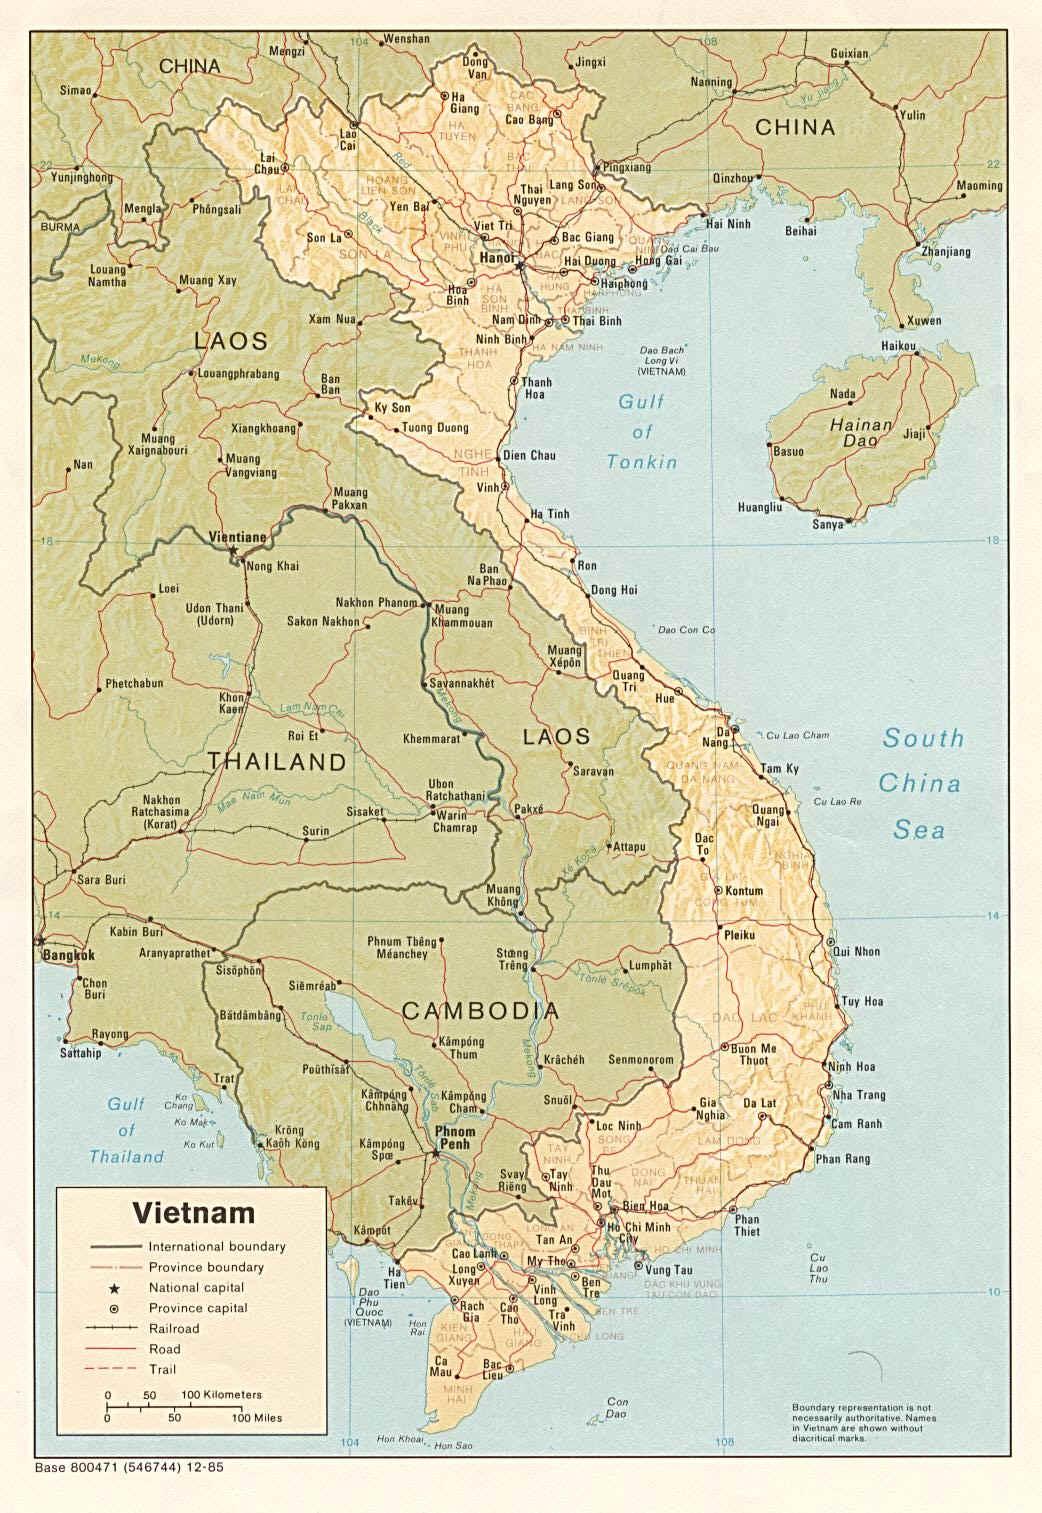 Vietnamkrieg Karte.Karten Zum Vietnamkrieg